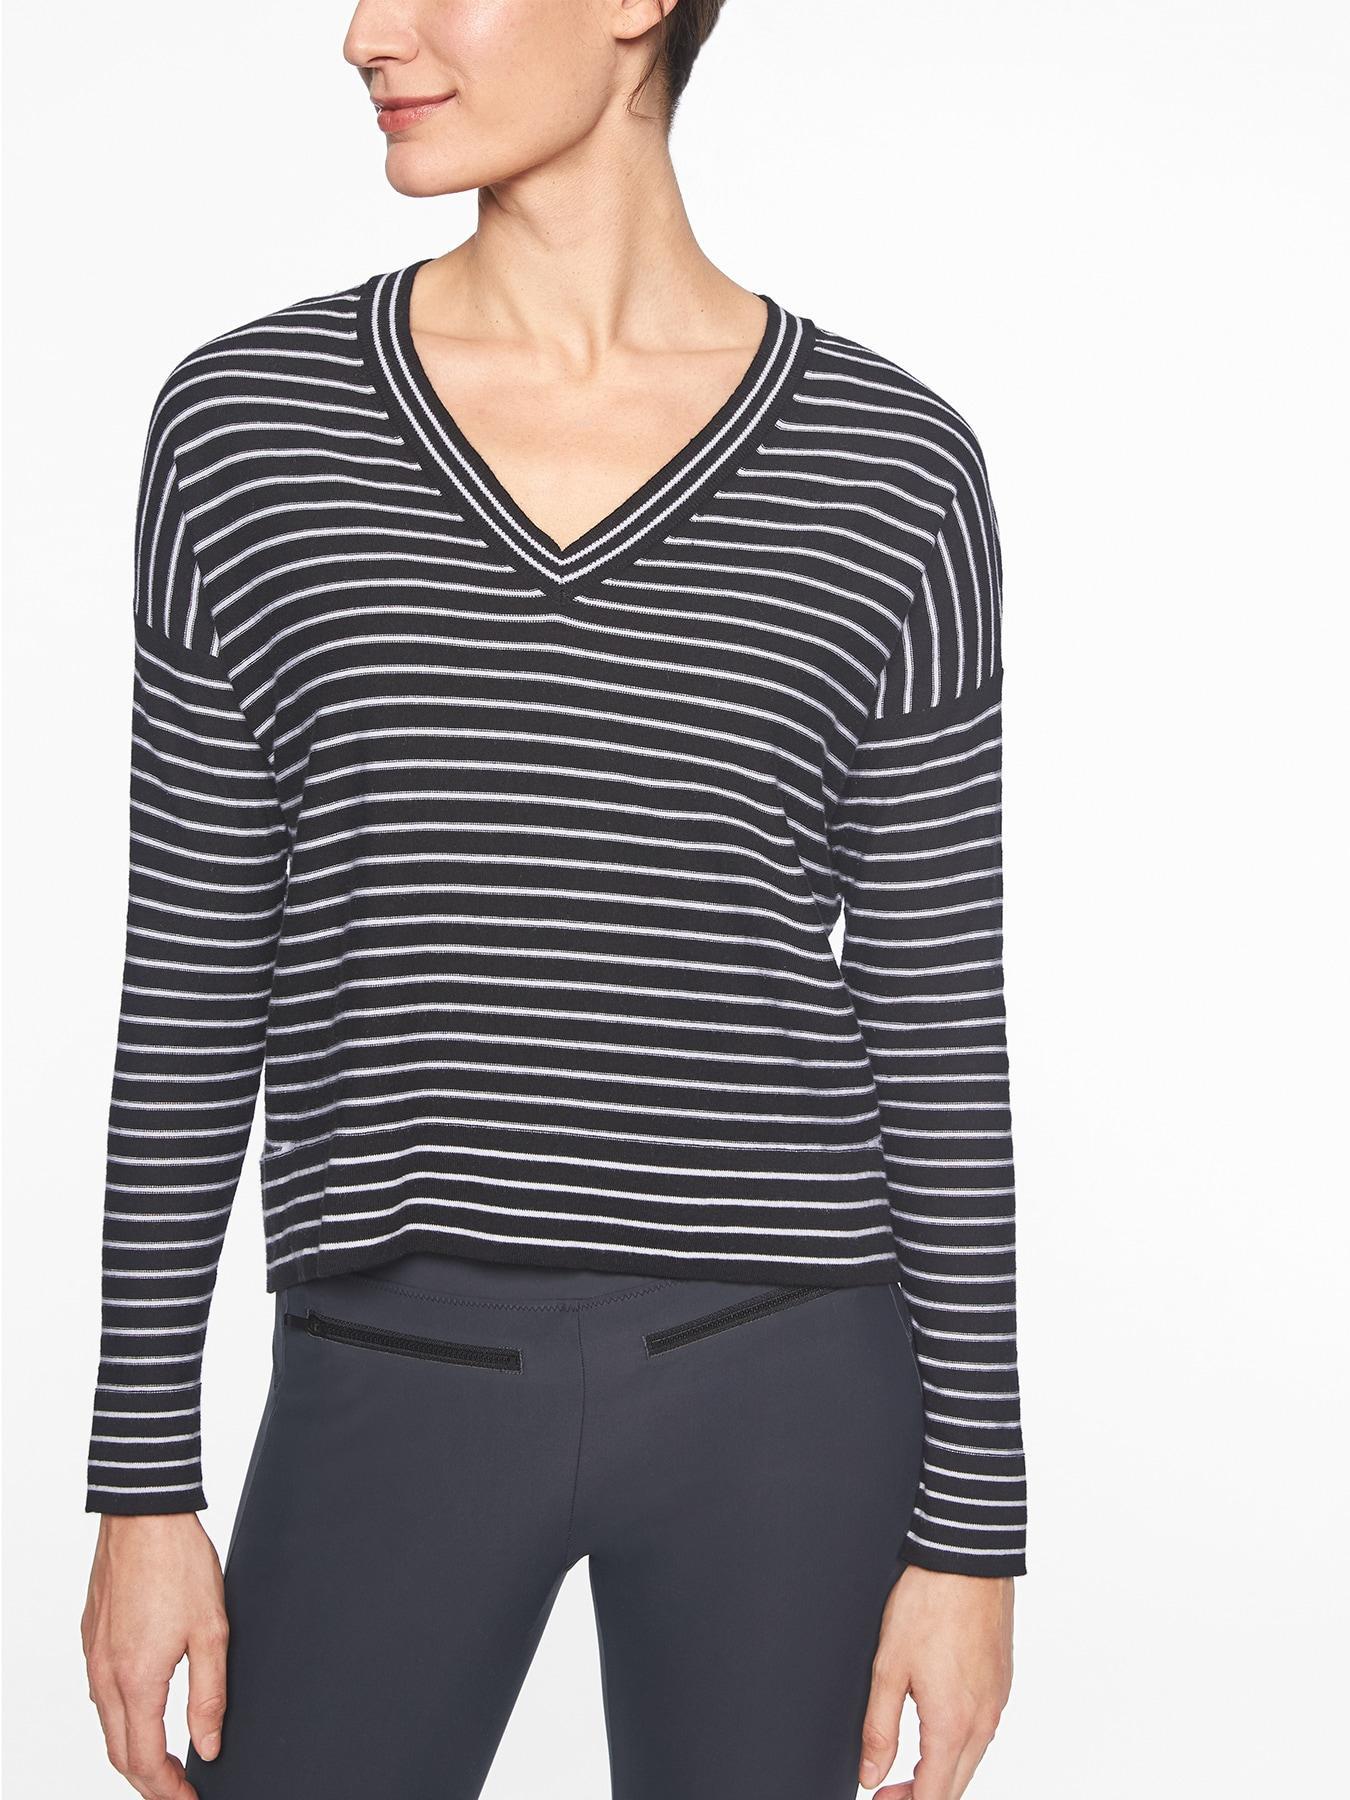 cb42a673ce7 Lyst - Athleta Retreat Sweater in Black